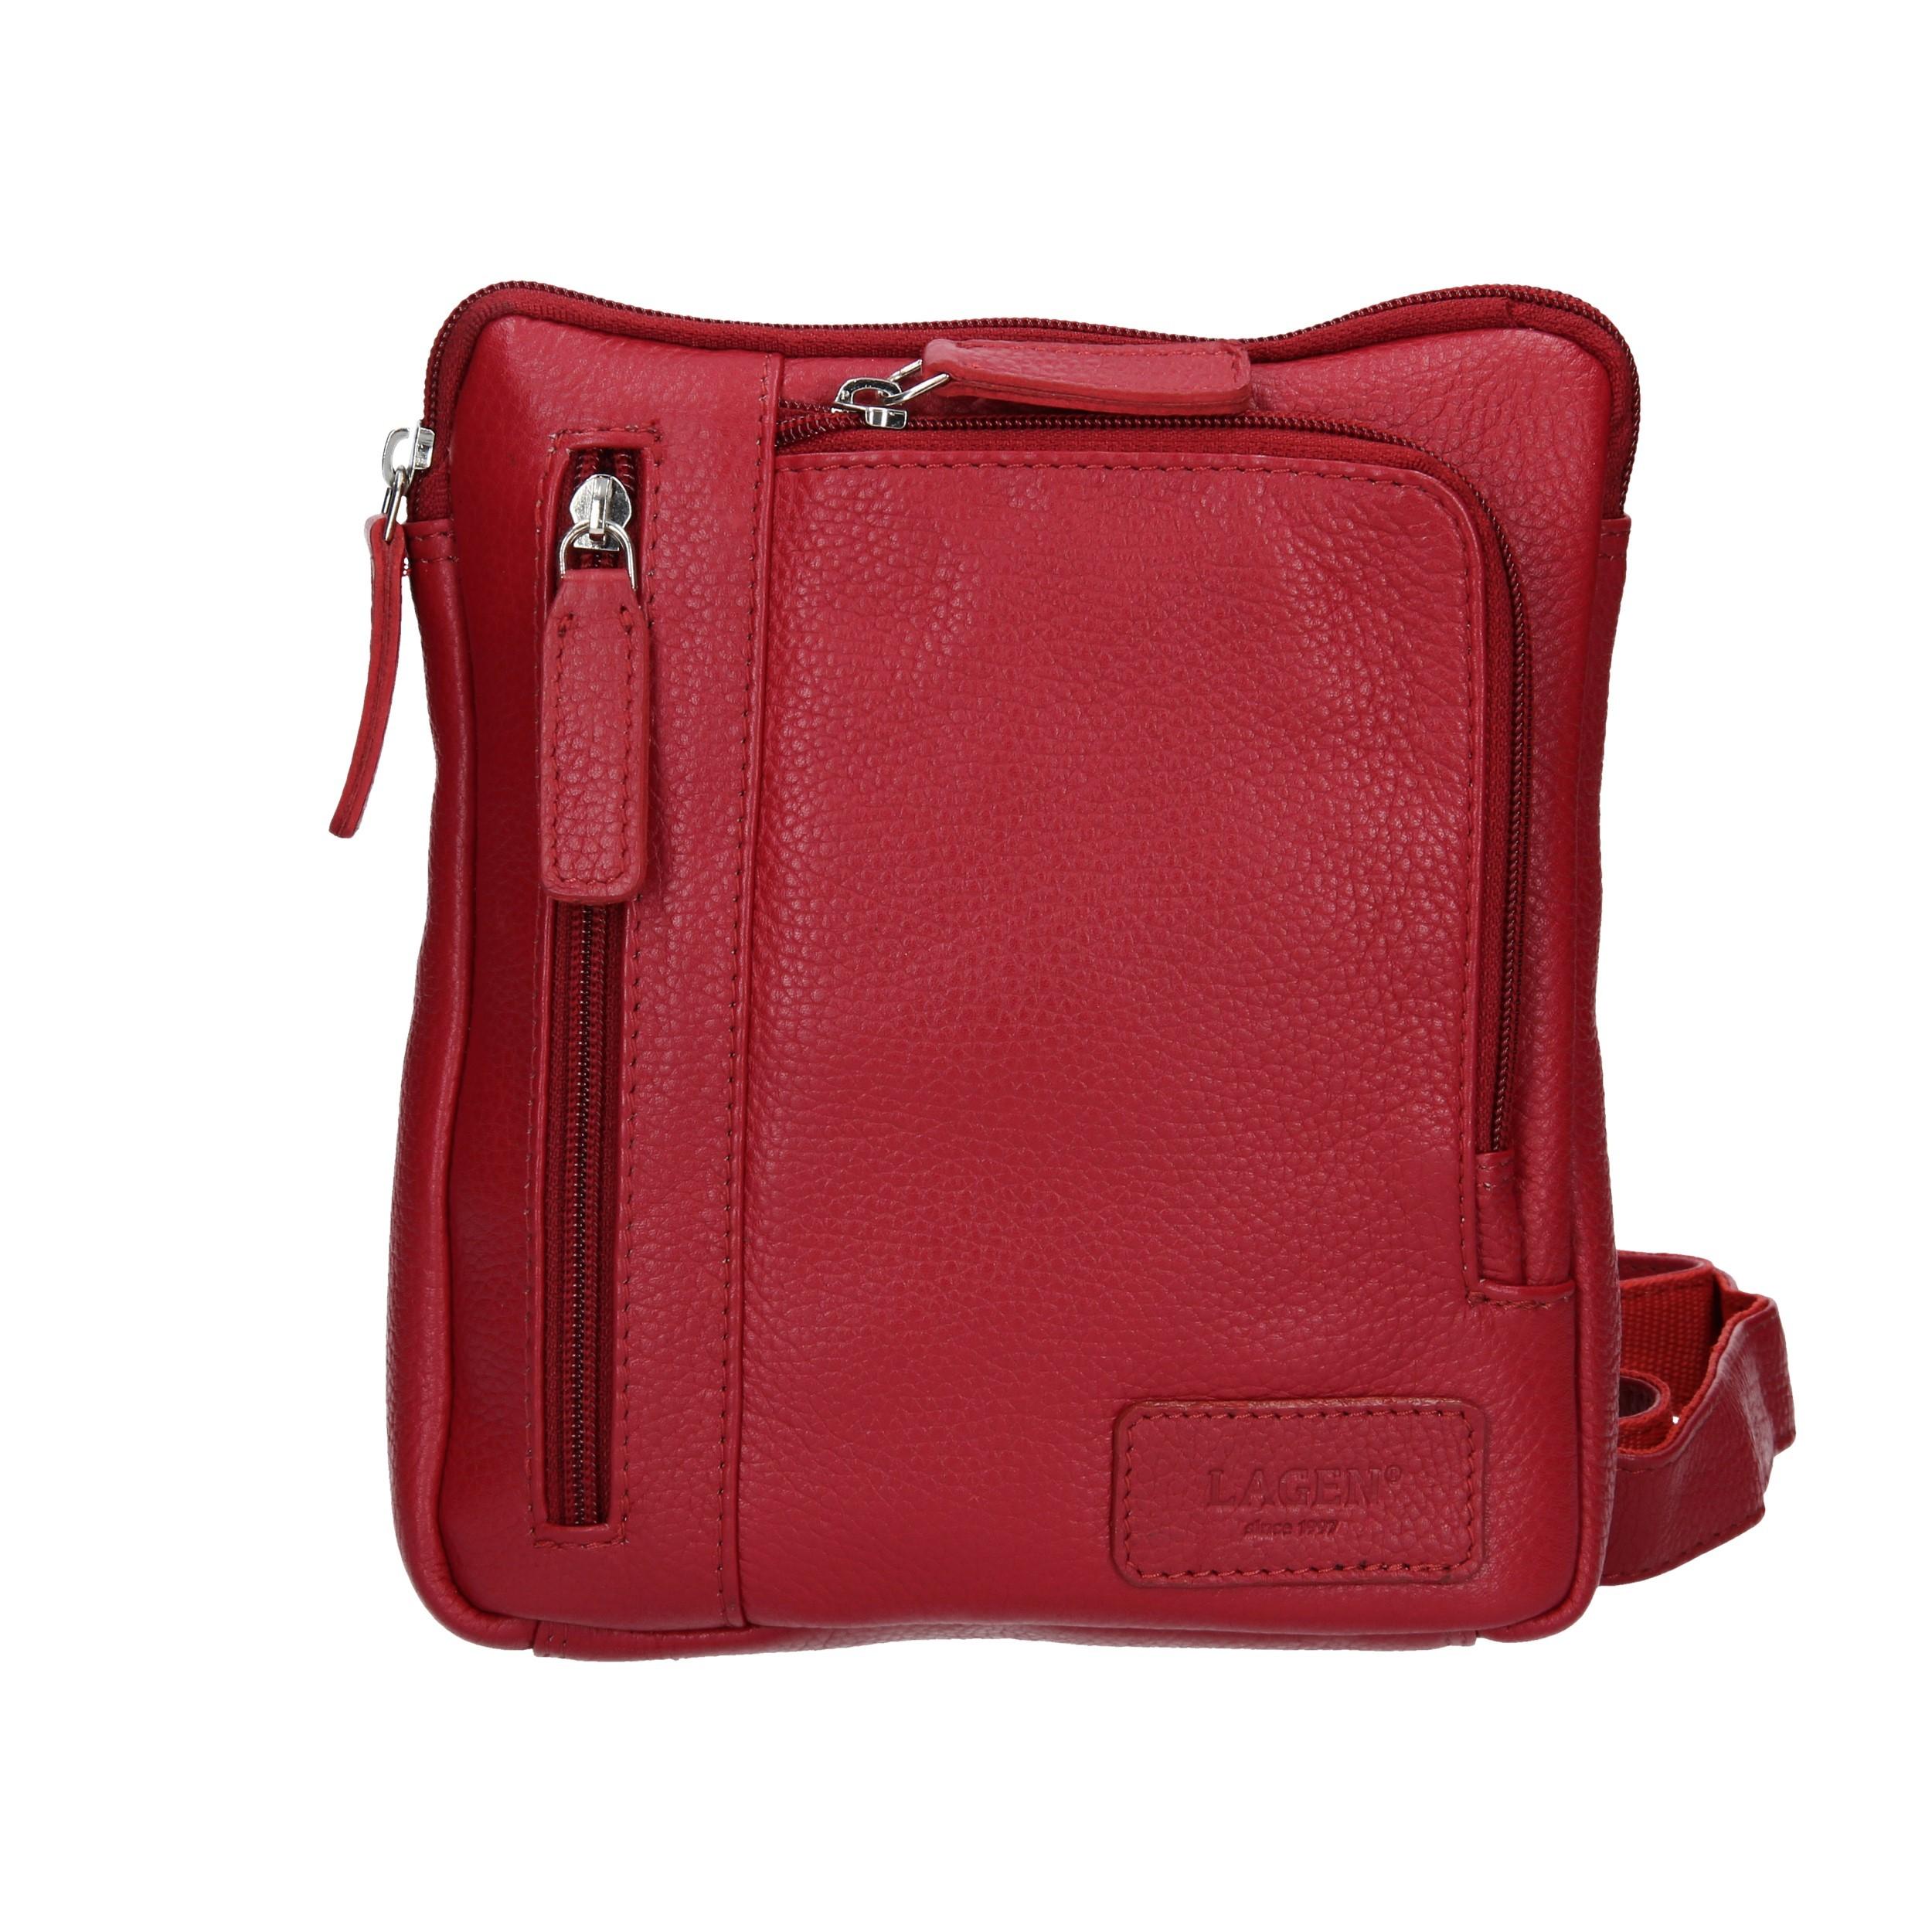 Dámska crossbody kabelka Lagen Marion- červená